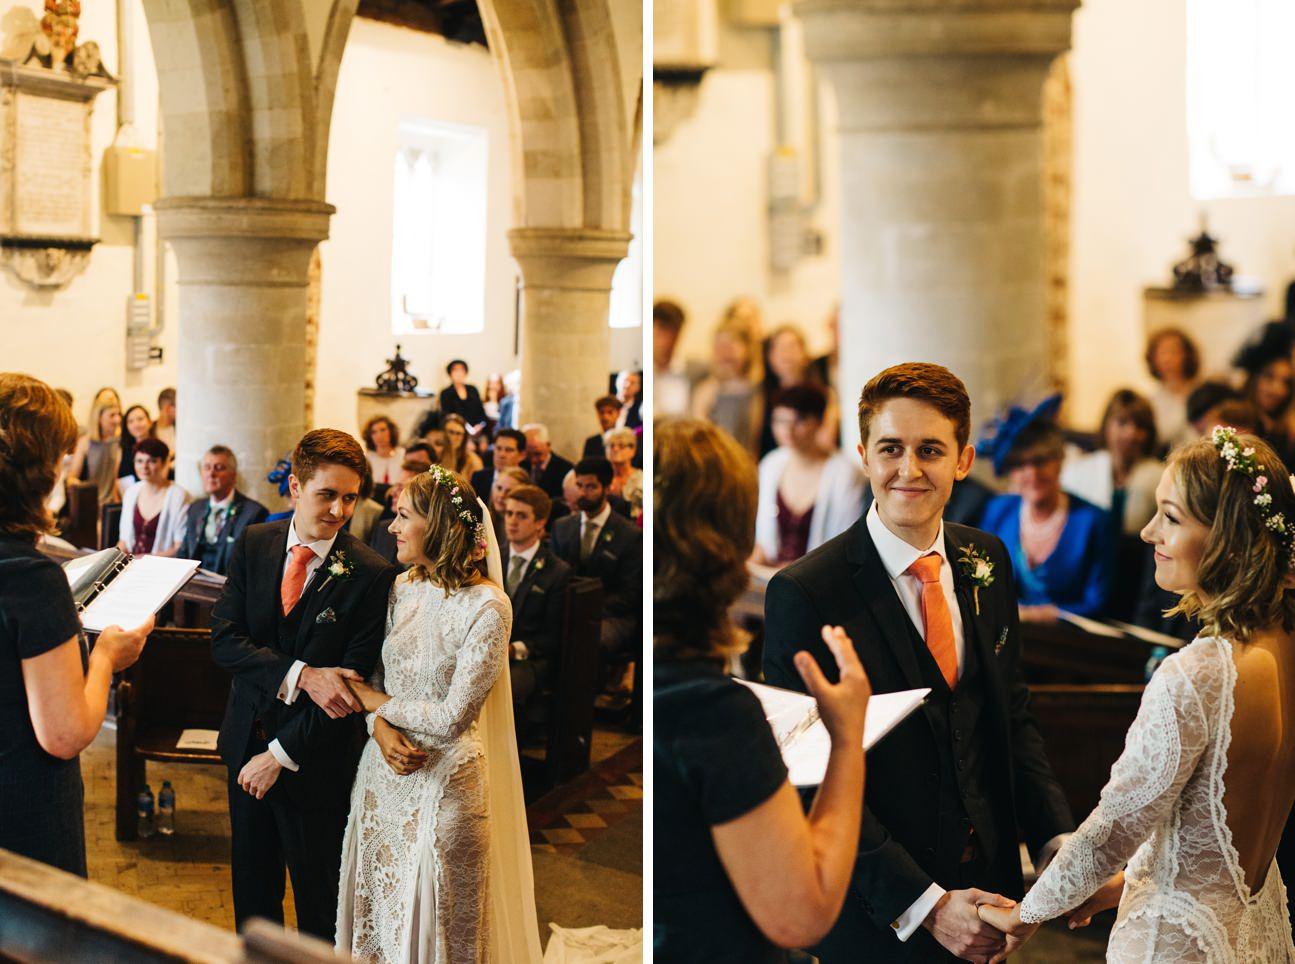 Hampshire Barn wedding in ibthorpe 044